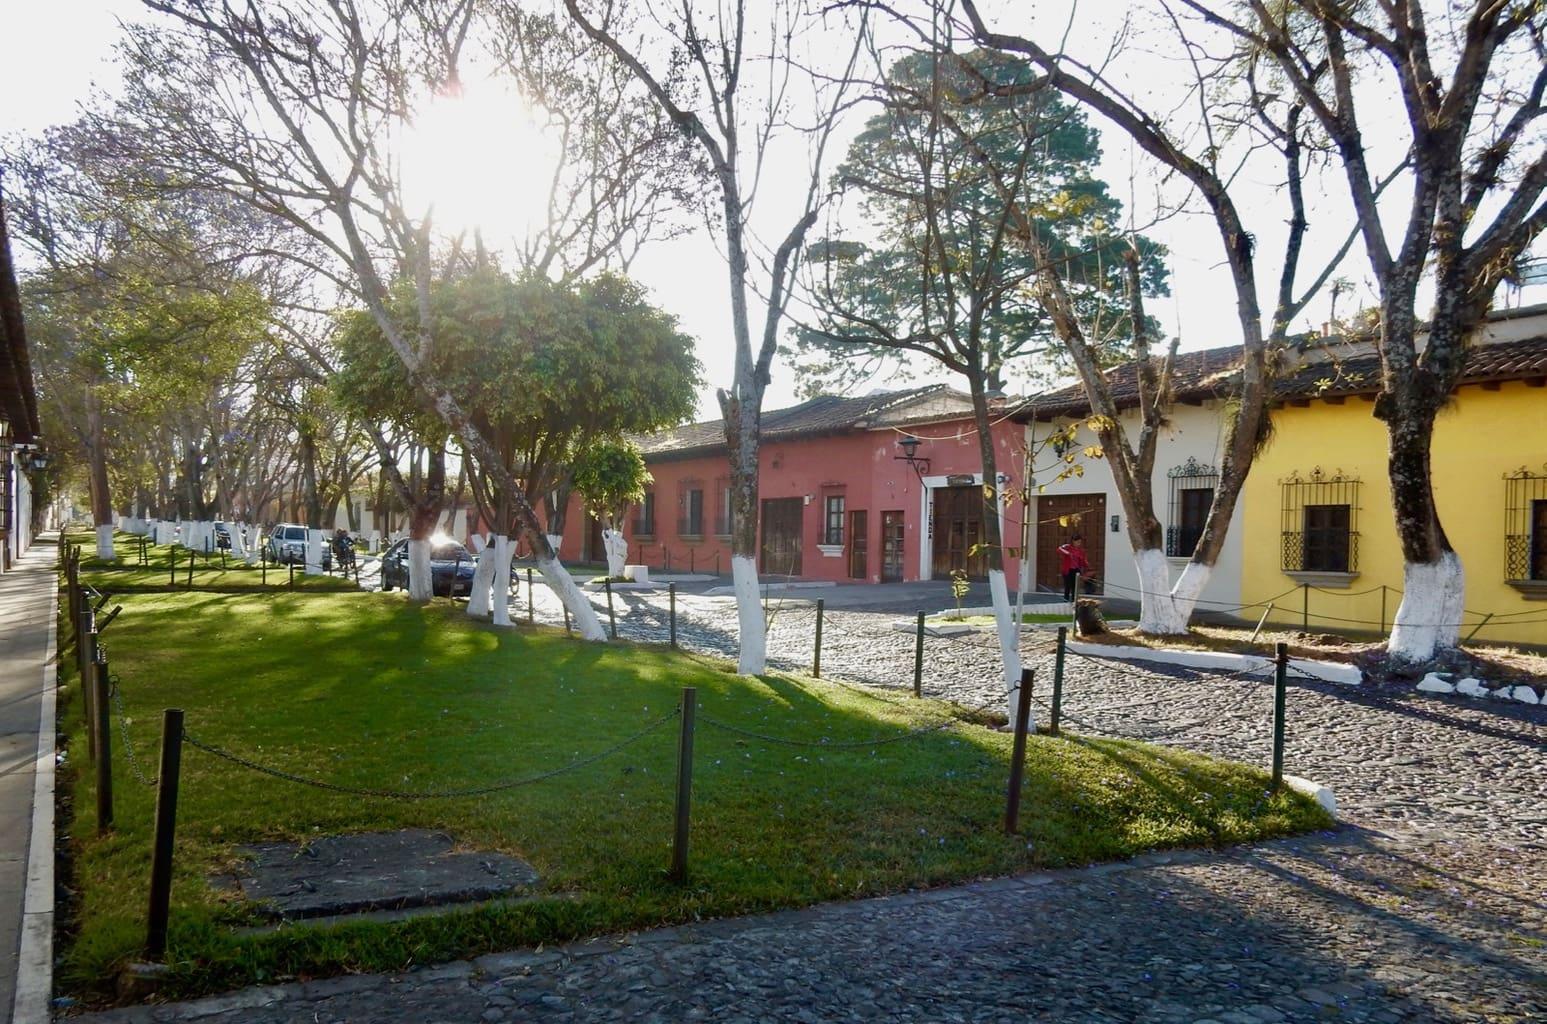 Residential street, Antigua Guatemala